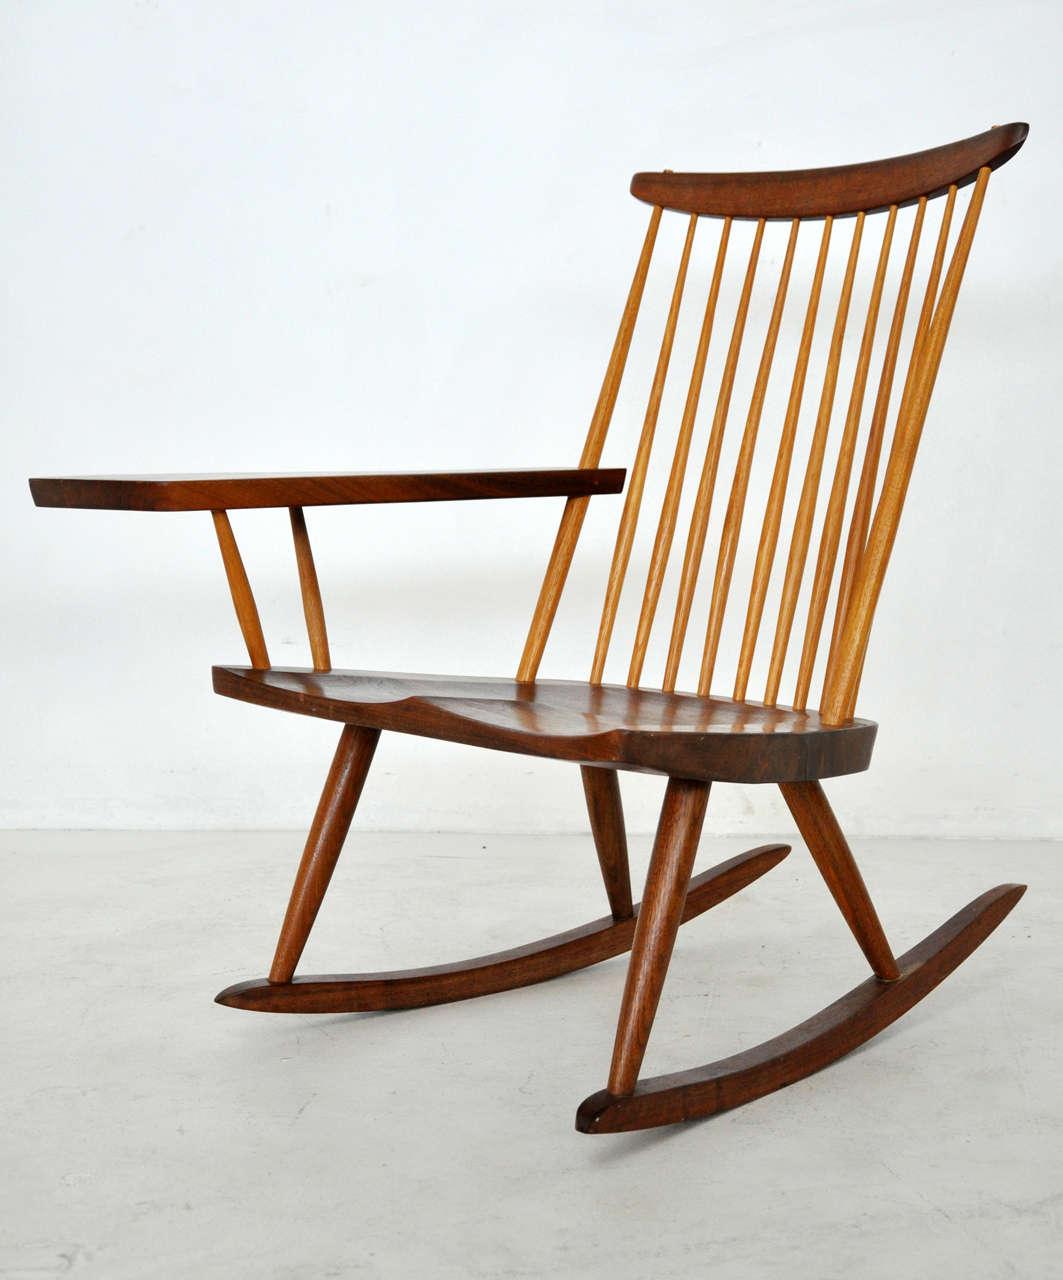 george nakashima rocking chair for sale at 1stdibs. Black Bedroom Furniture Sets. Home Design Ideas